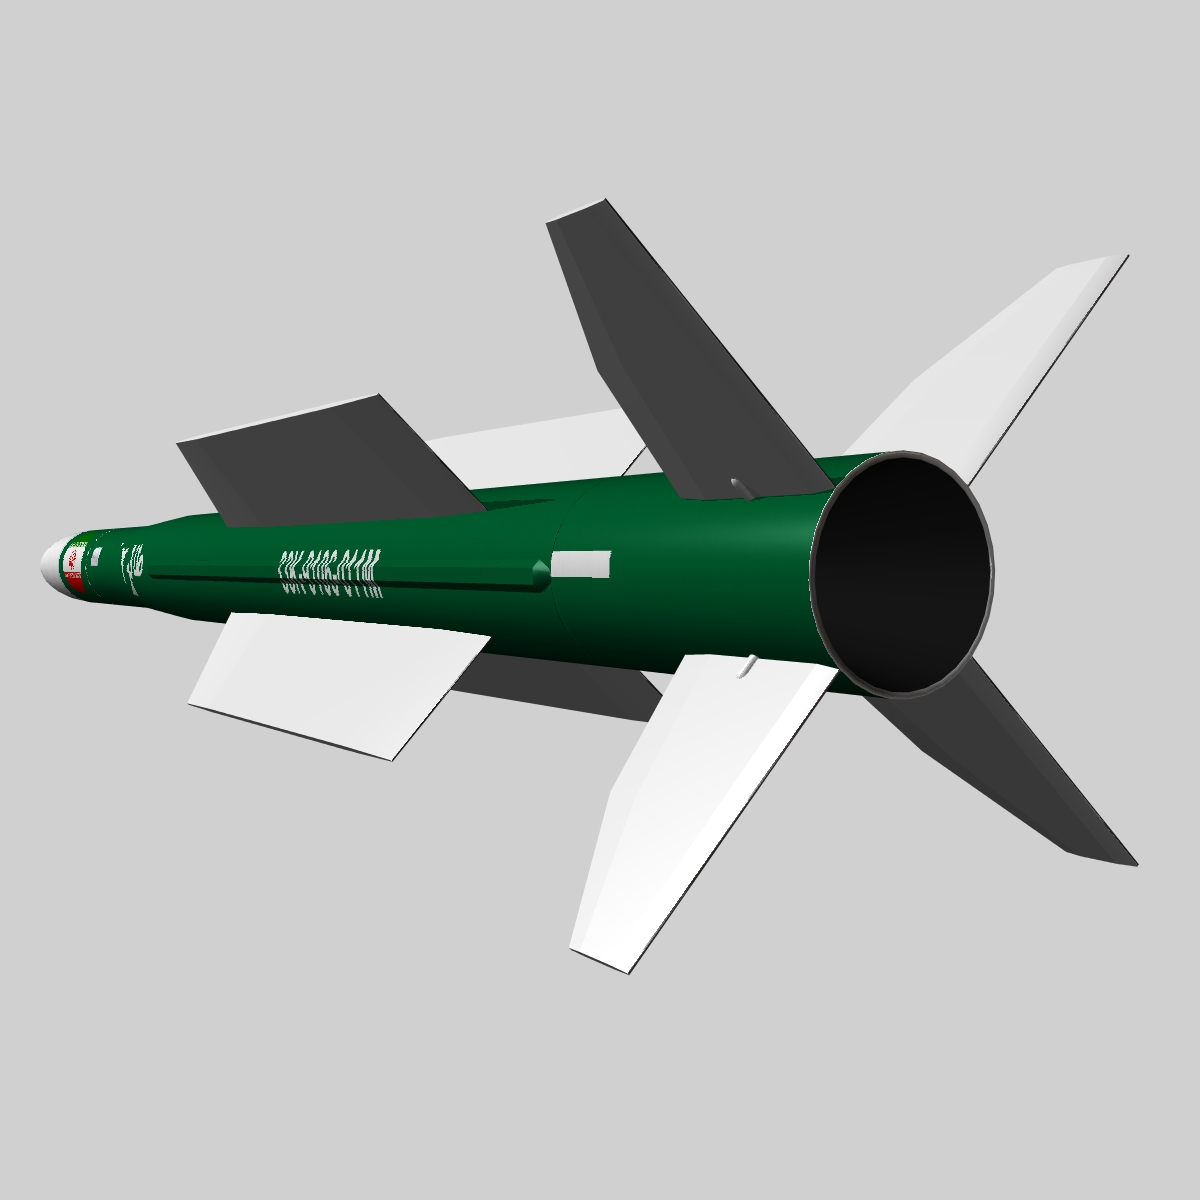 iranian taer-2 eldflaug 3d líkan 3ds dxf x þorskskoða obj 149242